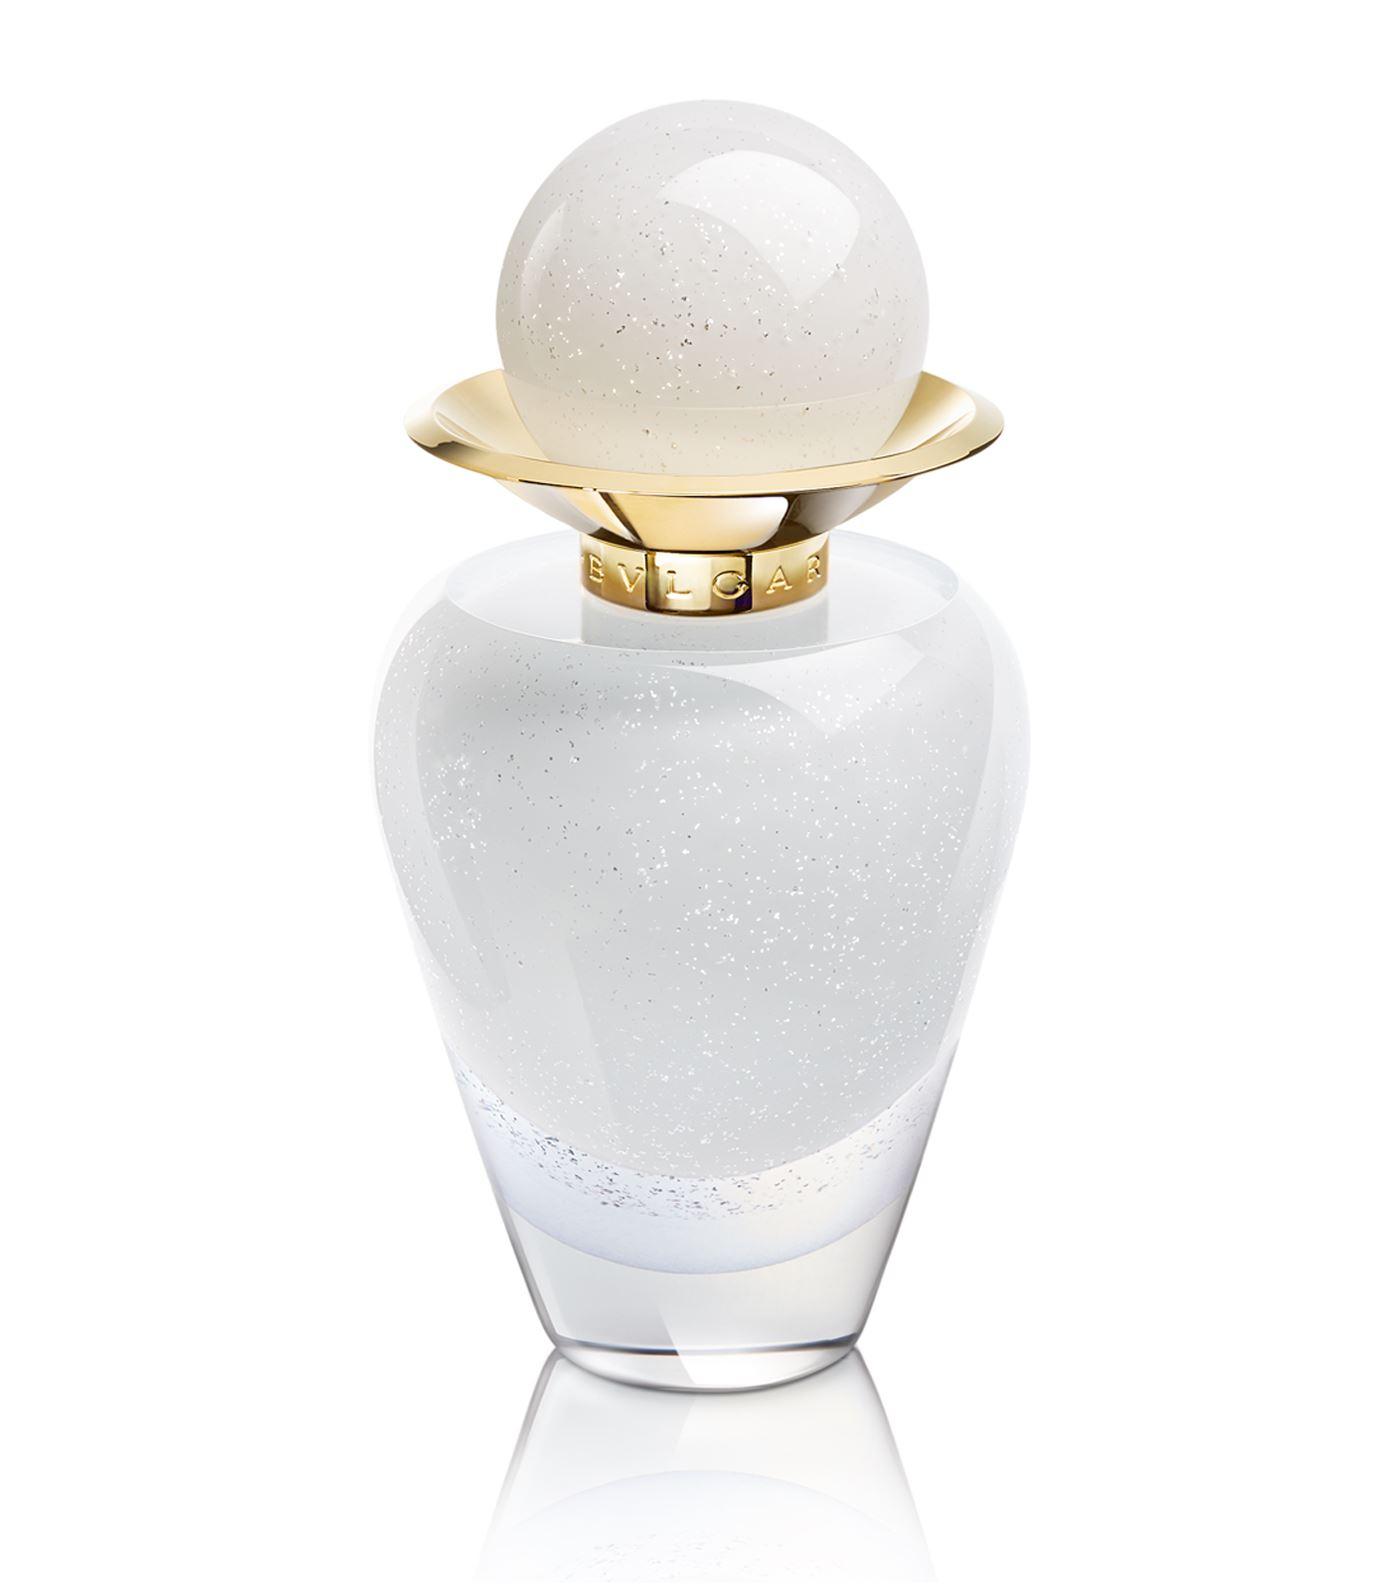 Murano Calaluna Bvlgari Perfume A New Fragrance For Women 2018 Bvgari Parfume